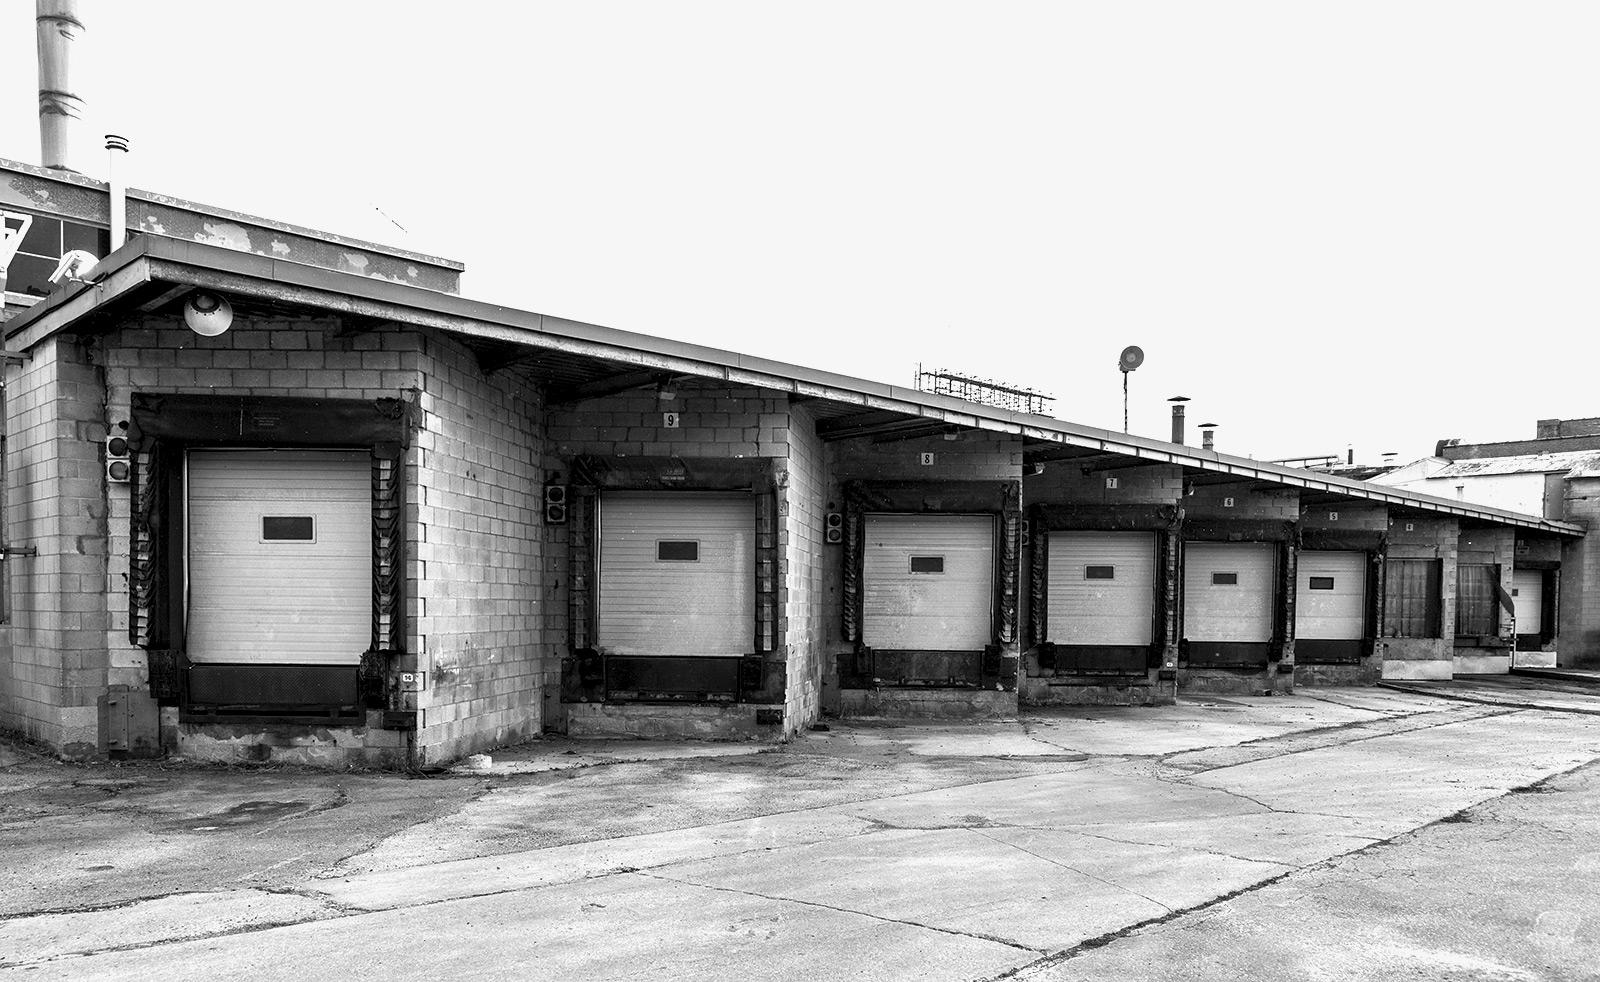 20140104. Canada Bread's loading dock has seen its last shipment. Liberty Village, Toronto.